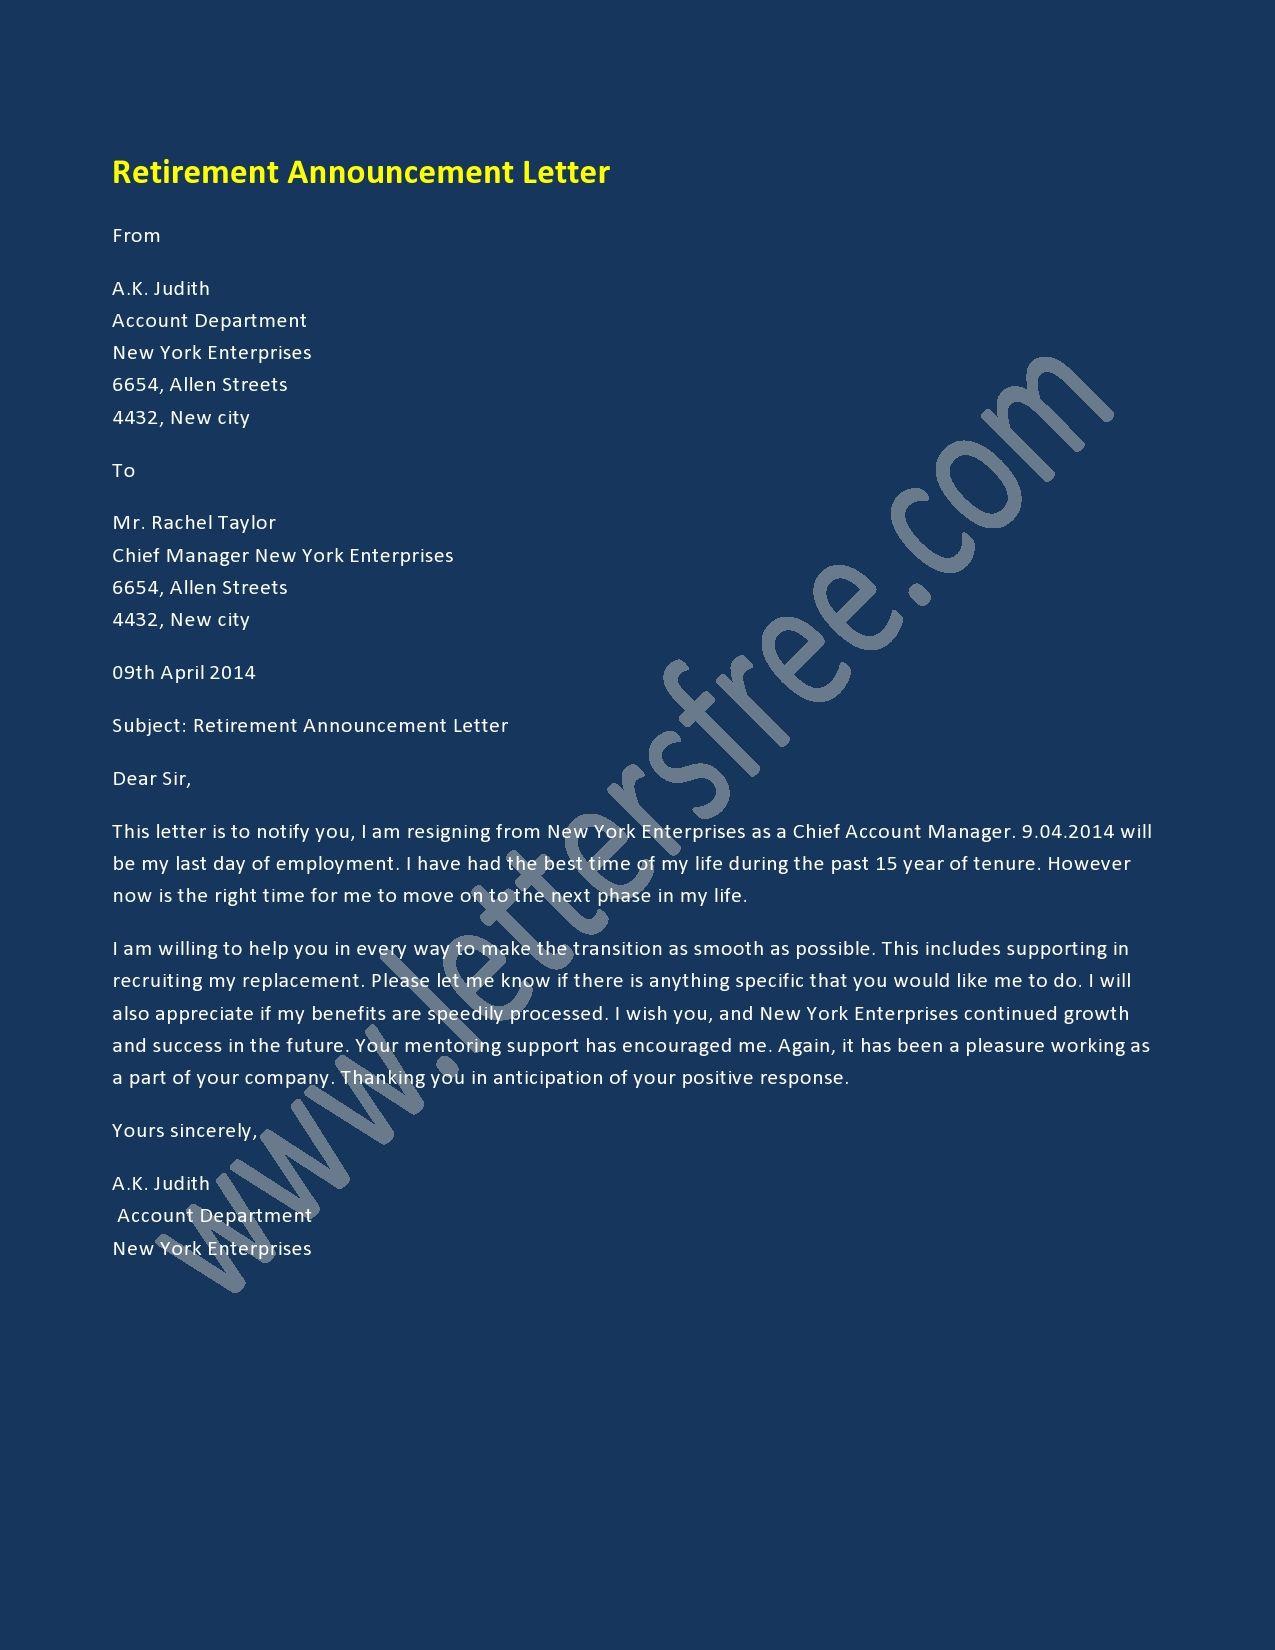 Retirement Announcement Letter is a formal letter